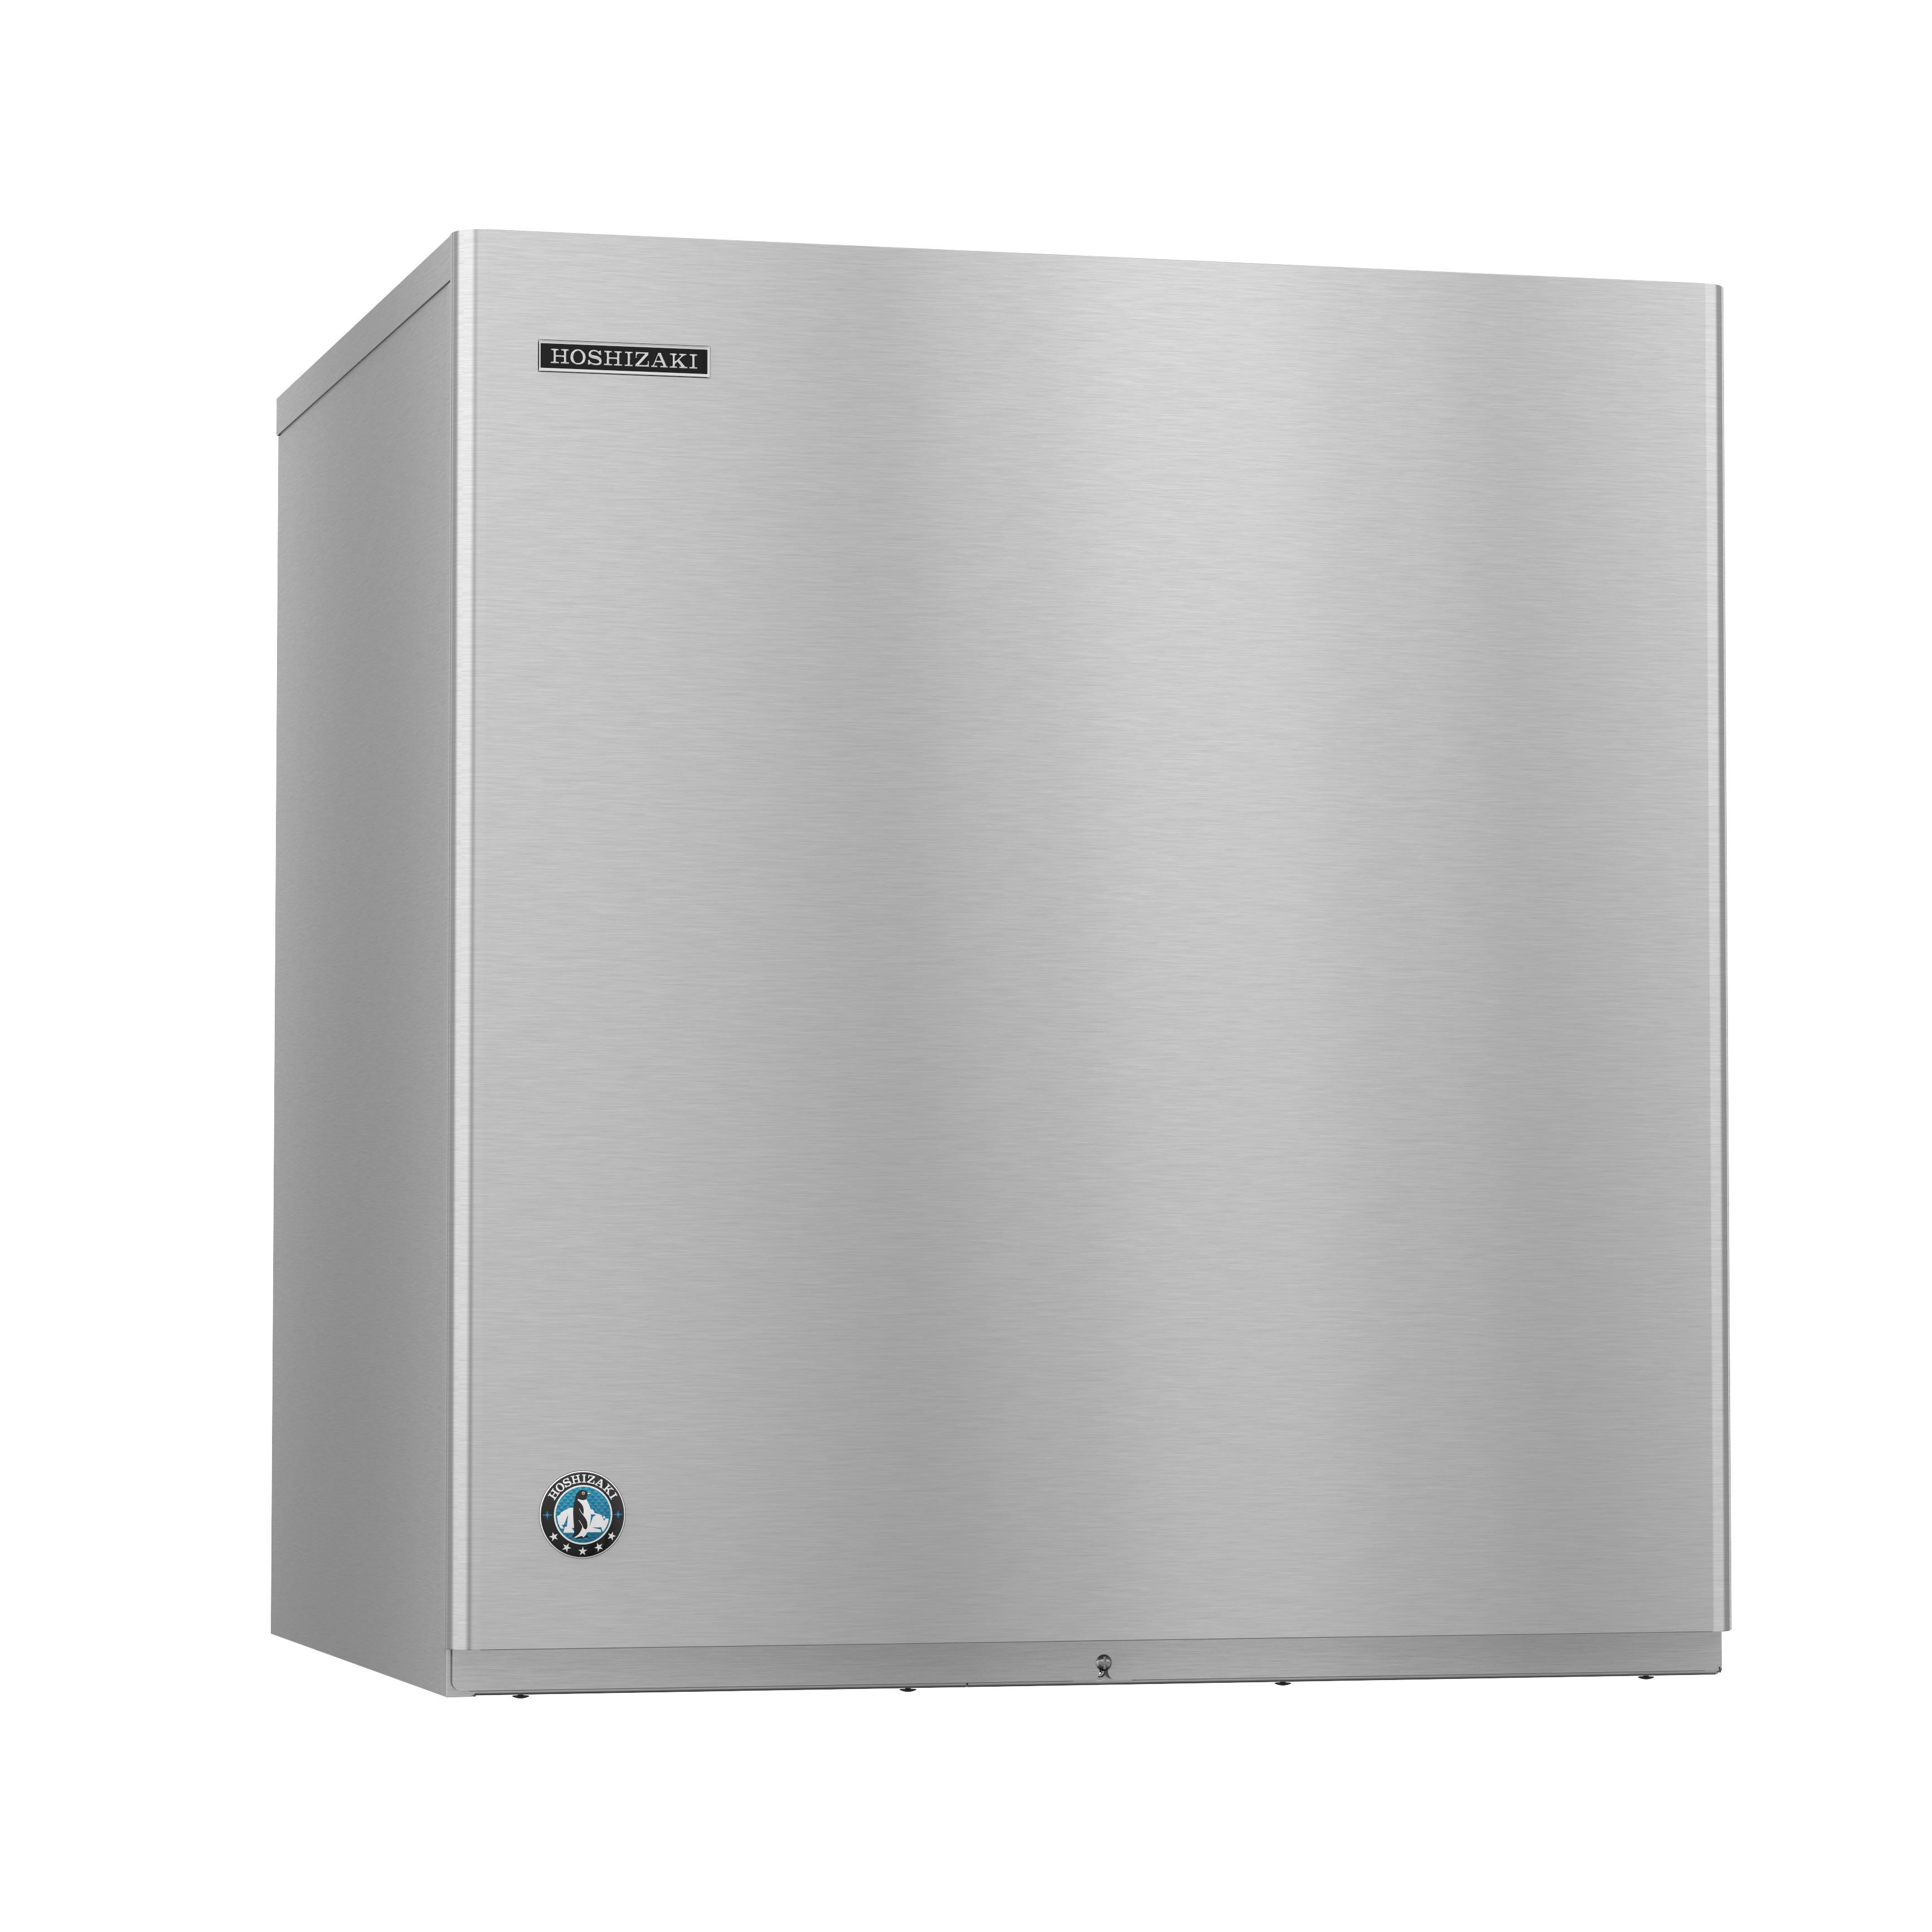 Hoshizaki KM-901MWJ ice cubers, ice storage & ice dispensers